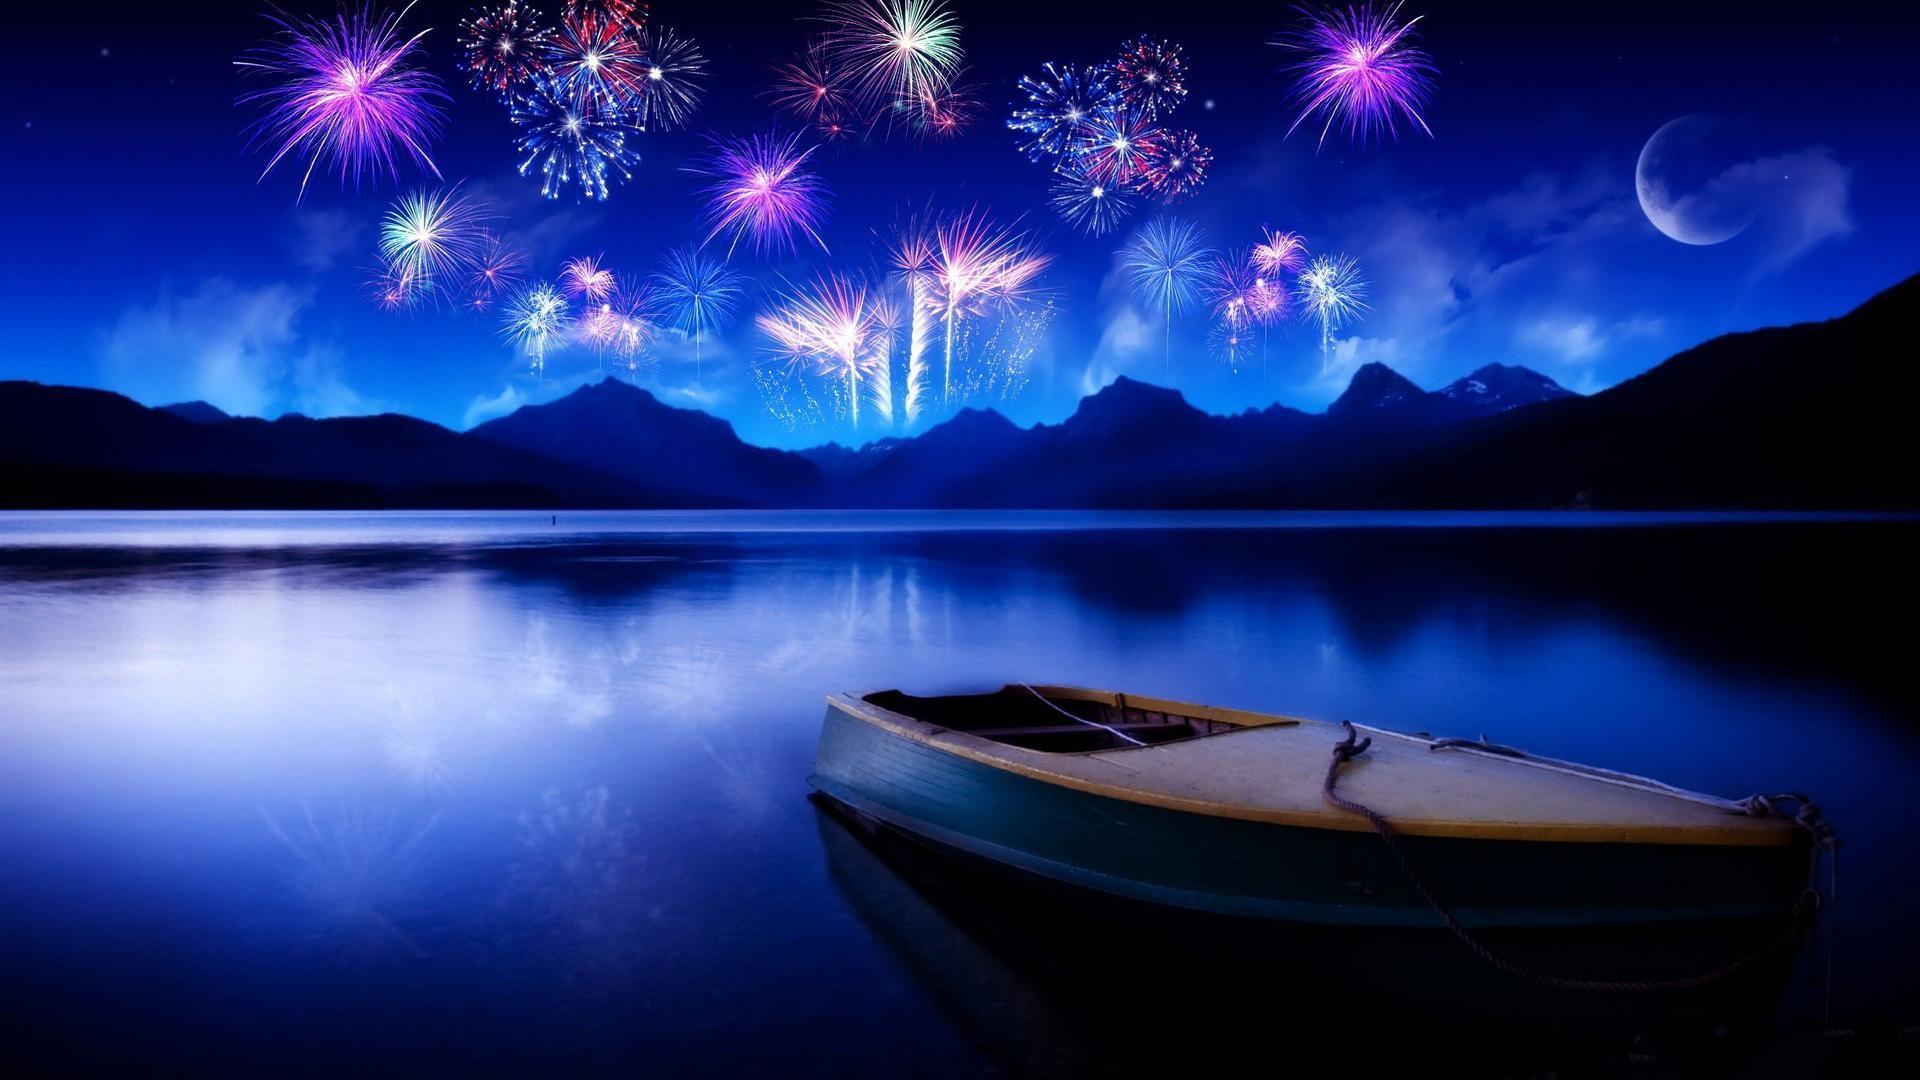 Cool Bright twilight fireworks lake desktop backgrounds wide  wallpapers:1280×800,1440×900,1680×1050